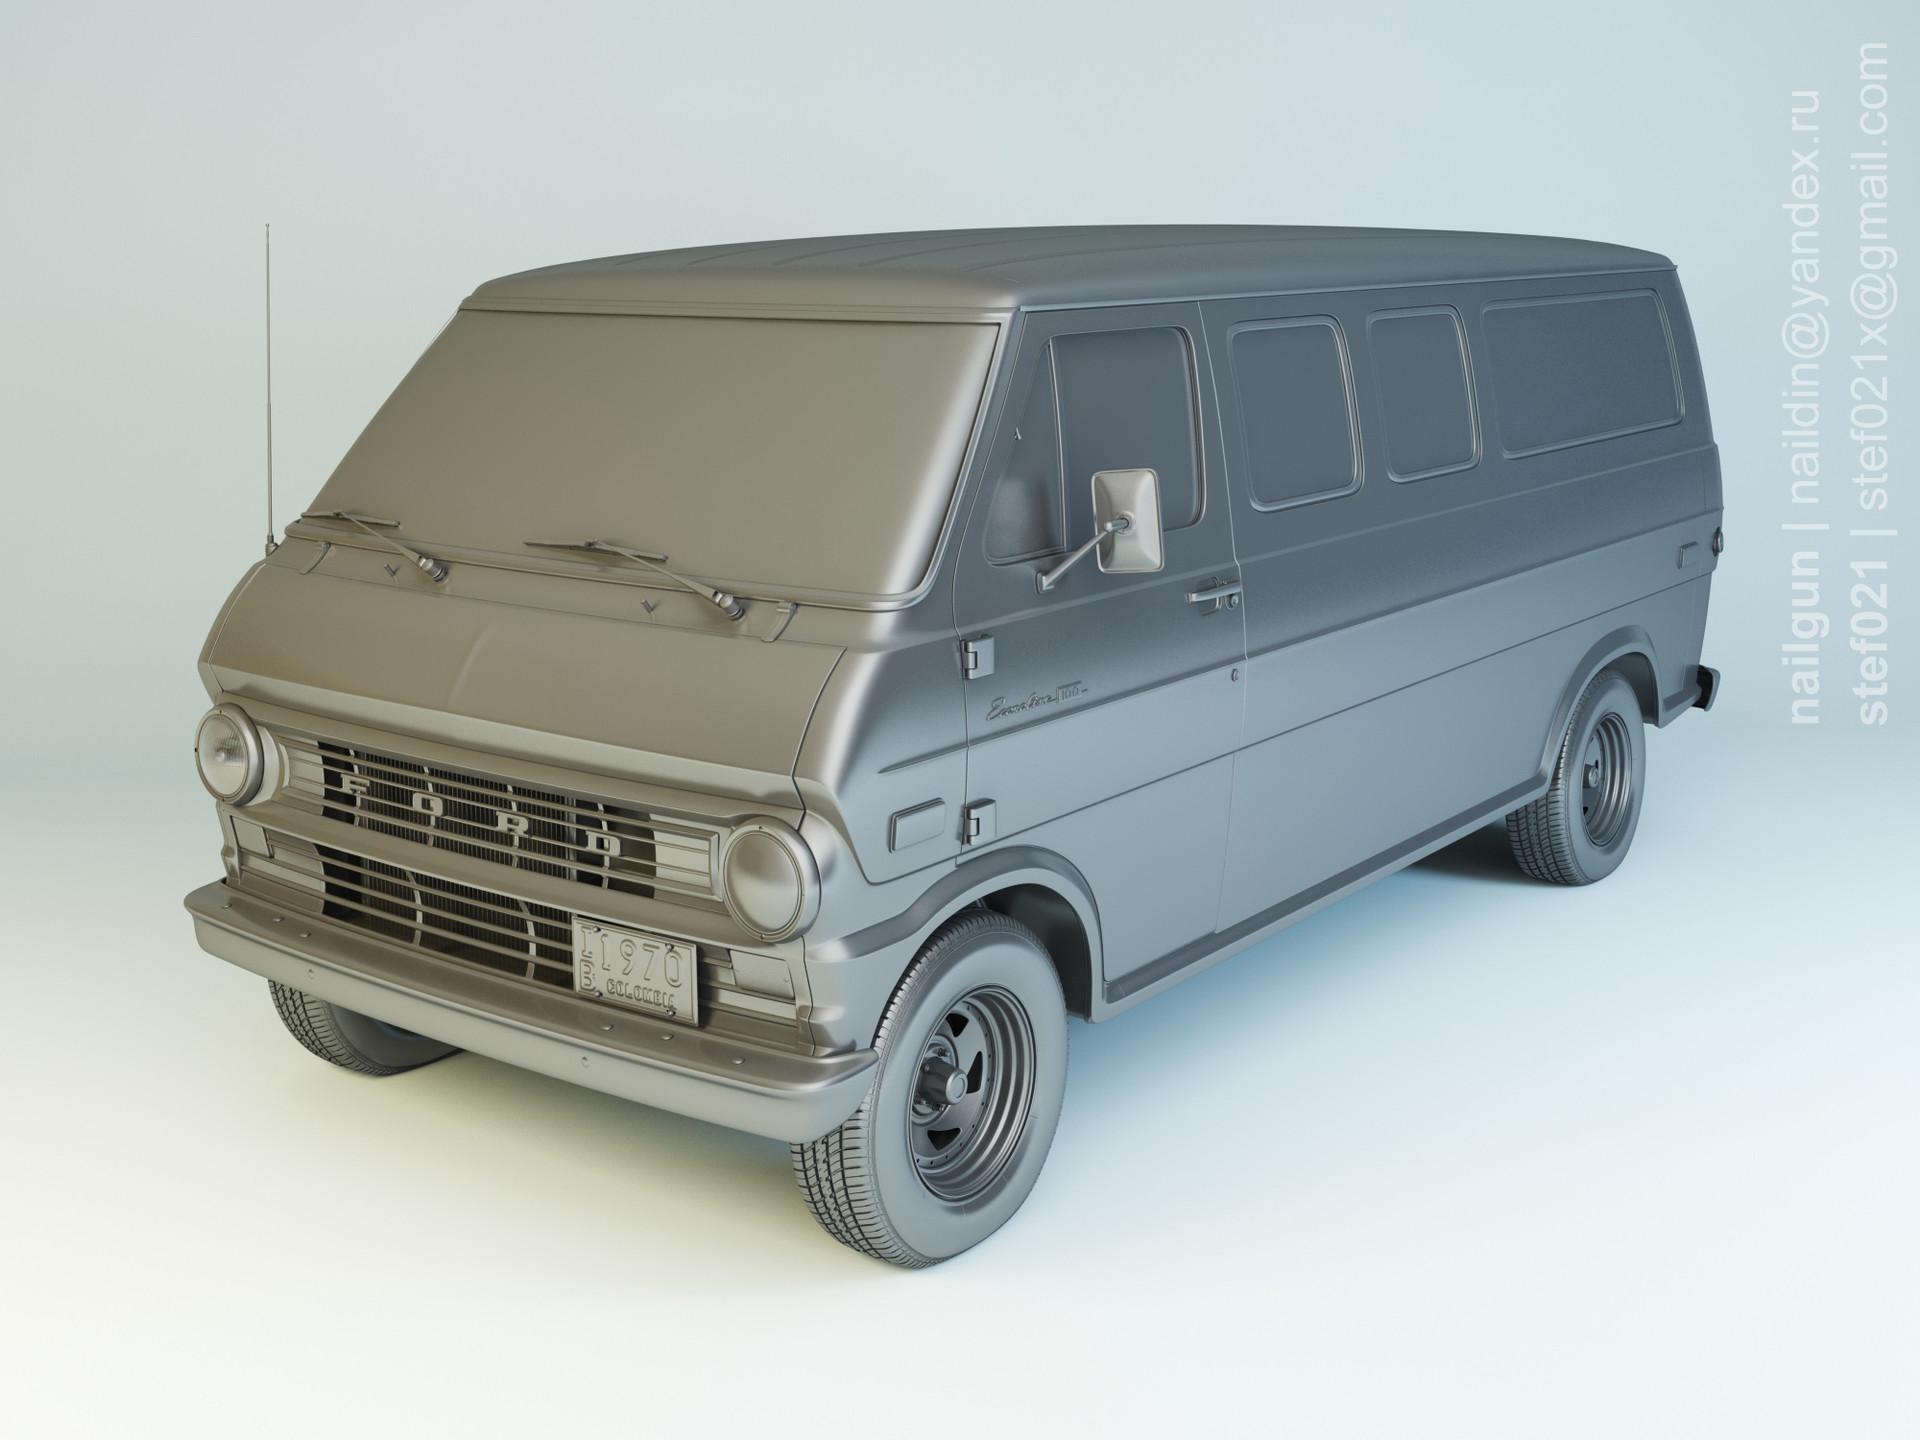 Nail khusnutdinov pwc 069 000 ford econoline modelling 0